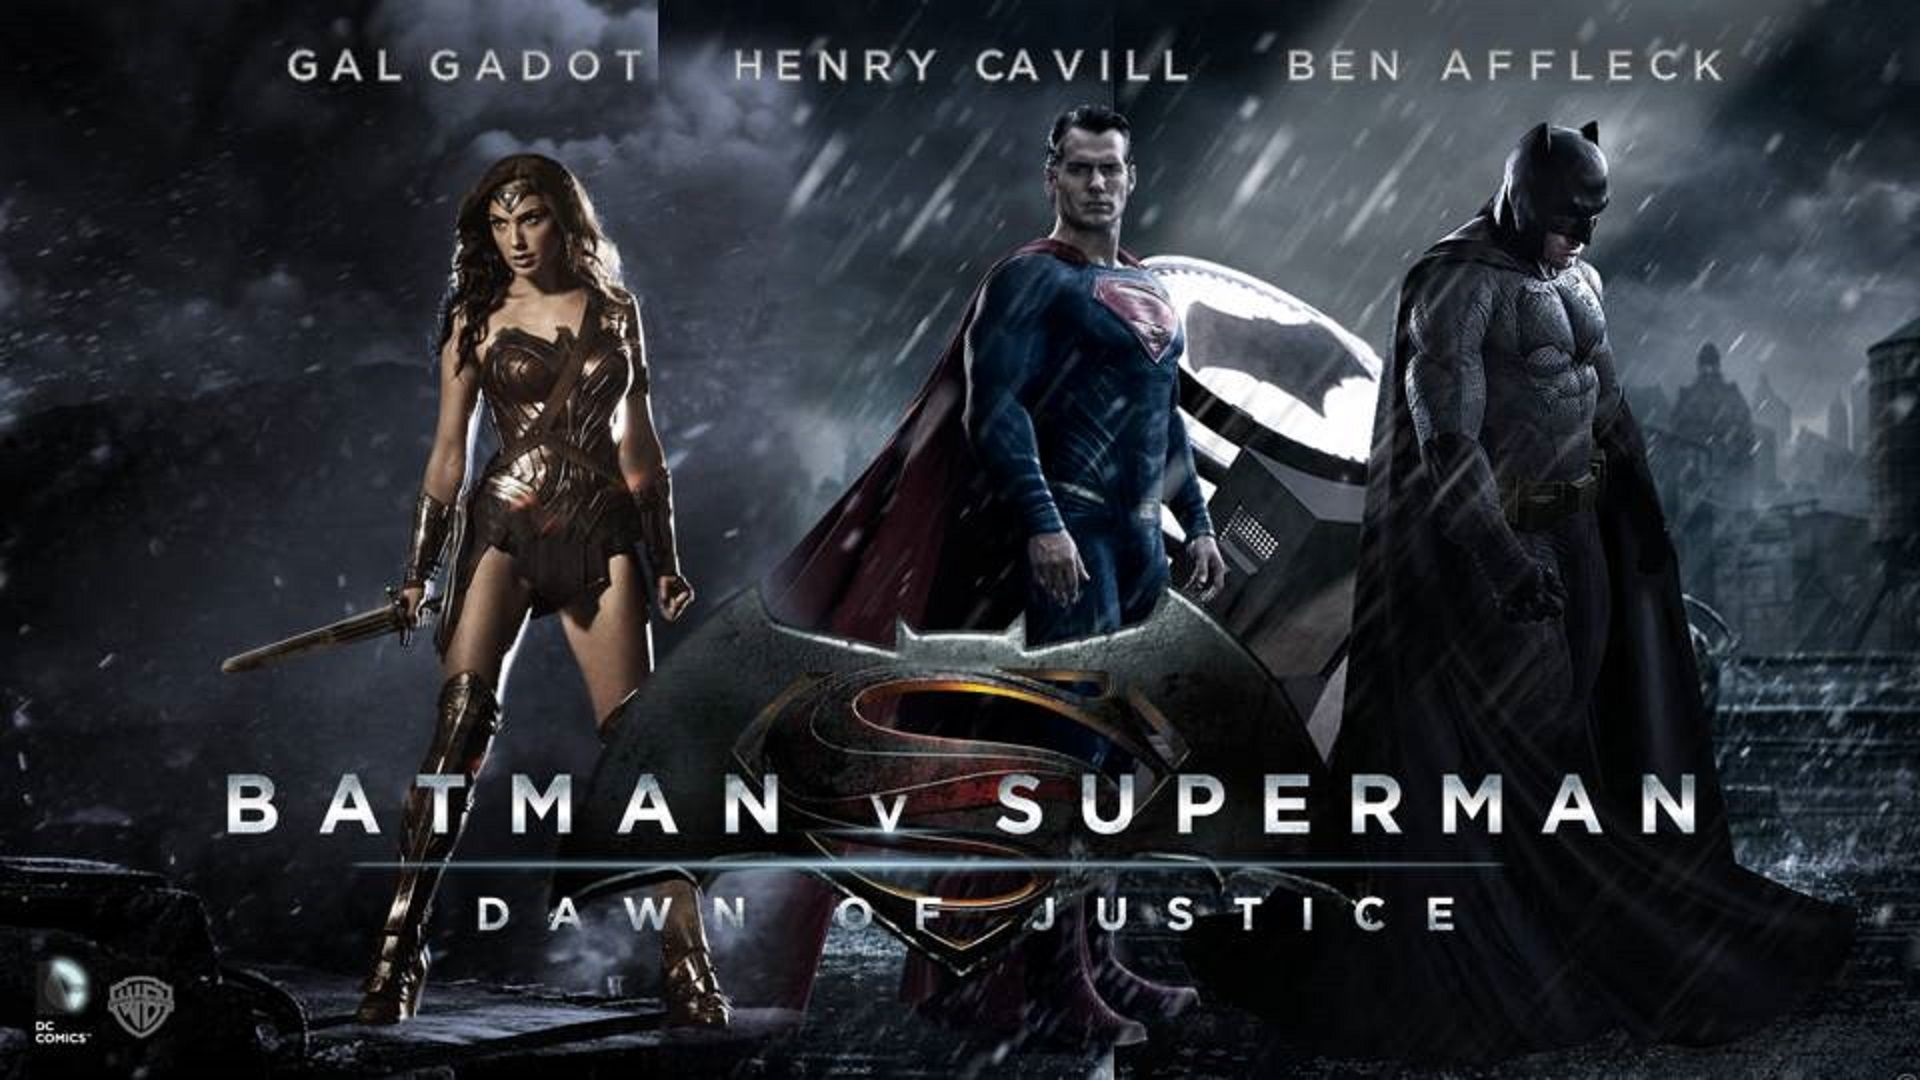 Image For Batman Vs Superman Dawn Of Justice Wallpaper Iphone Tmf13